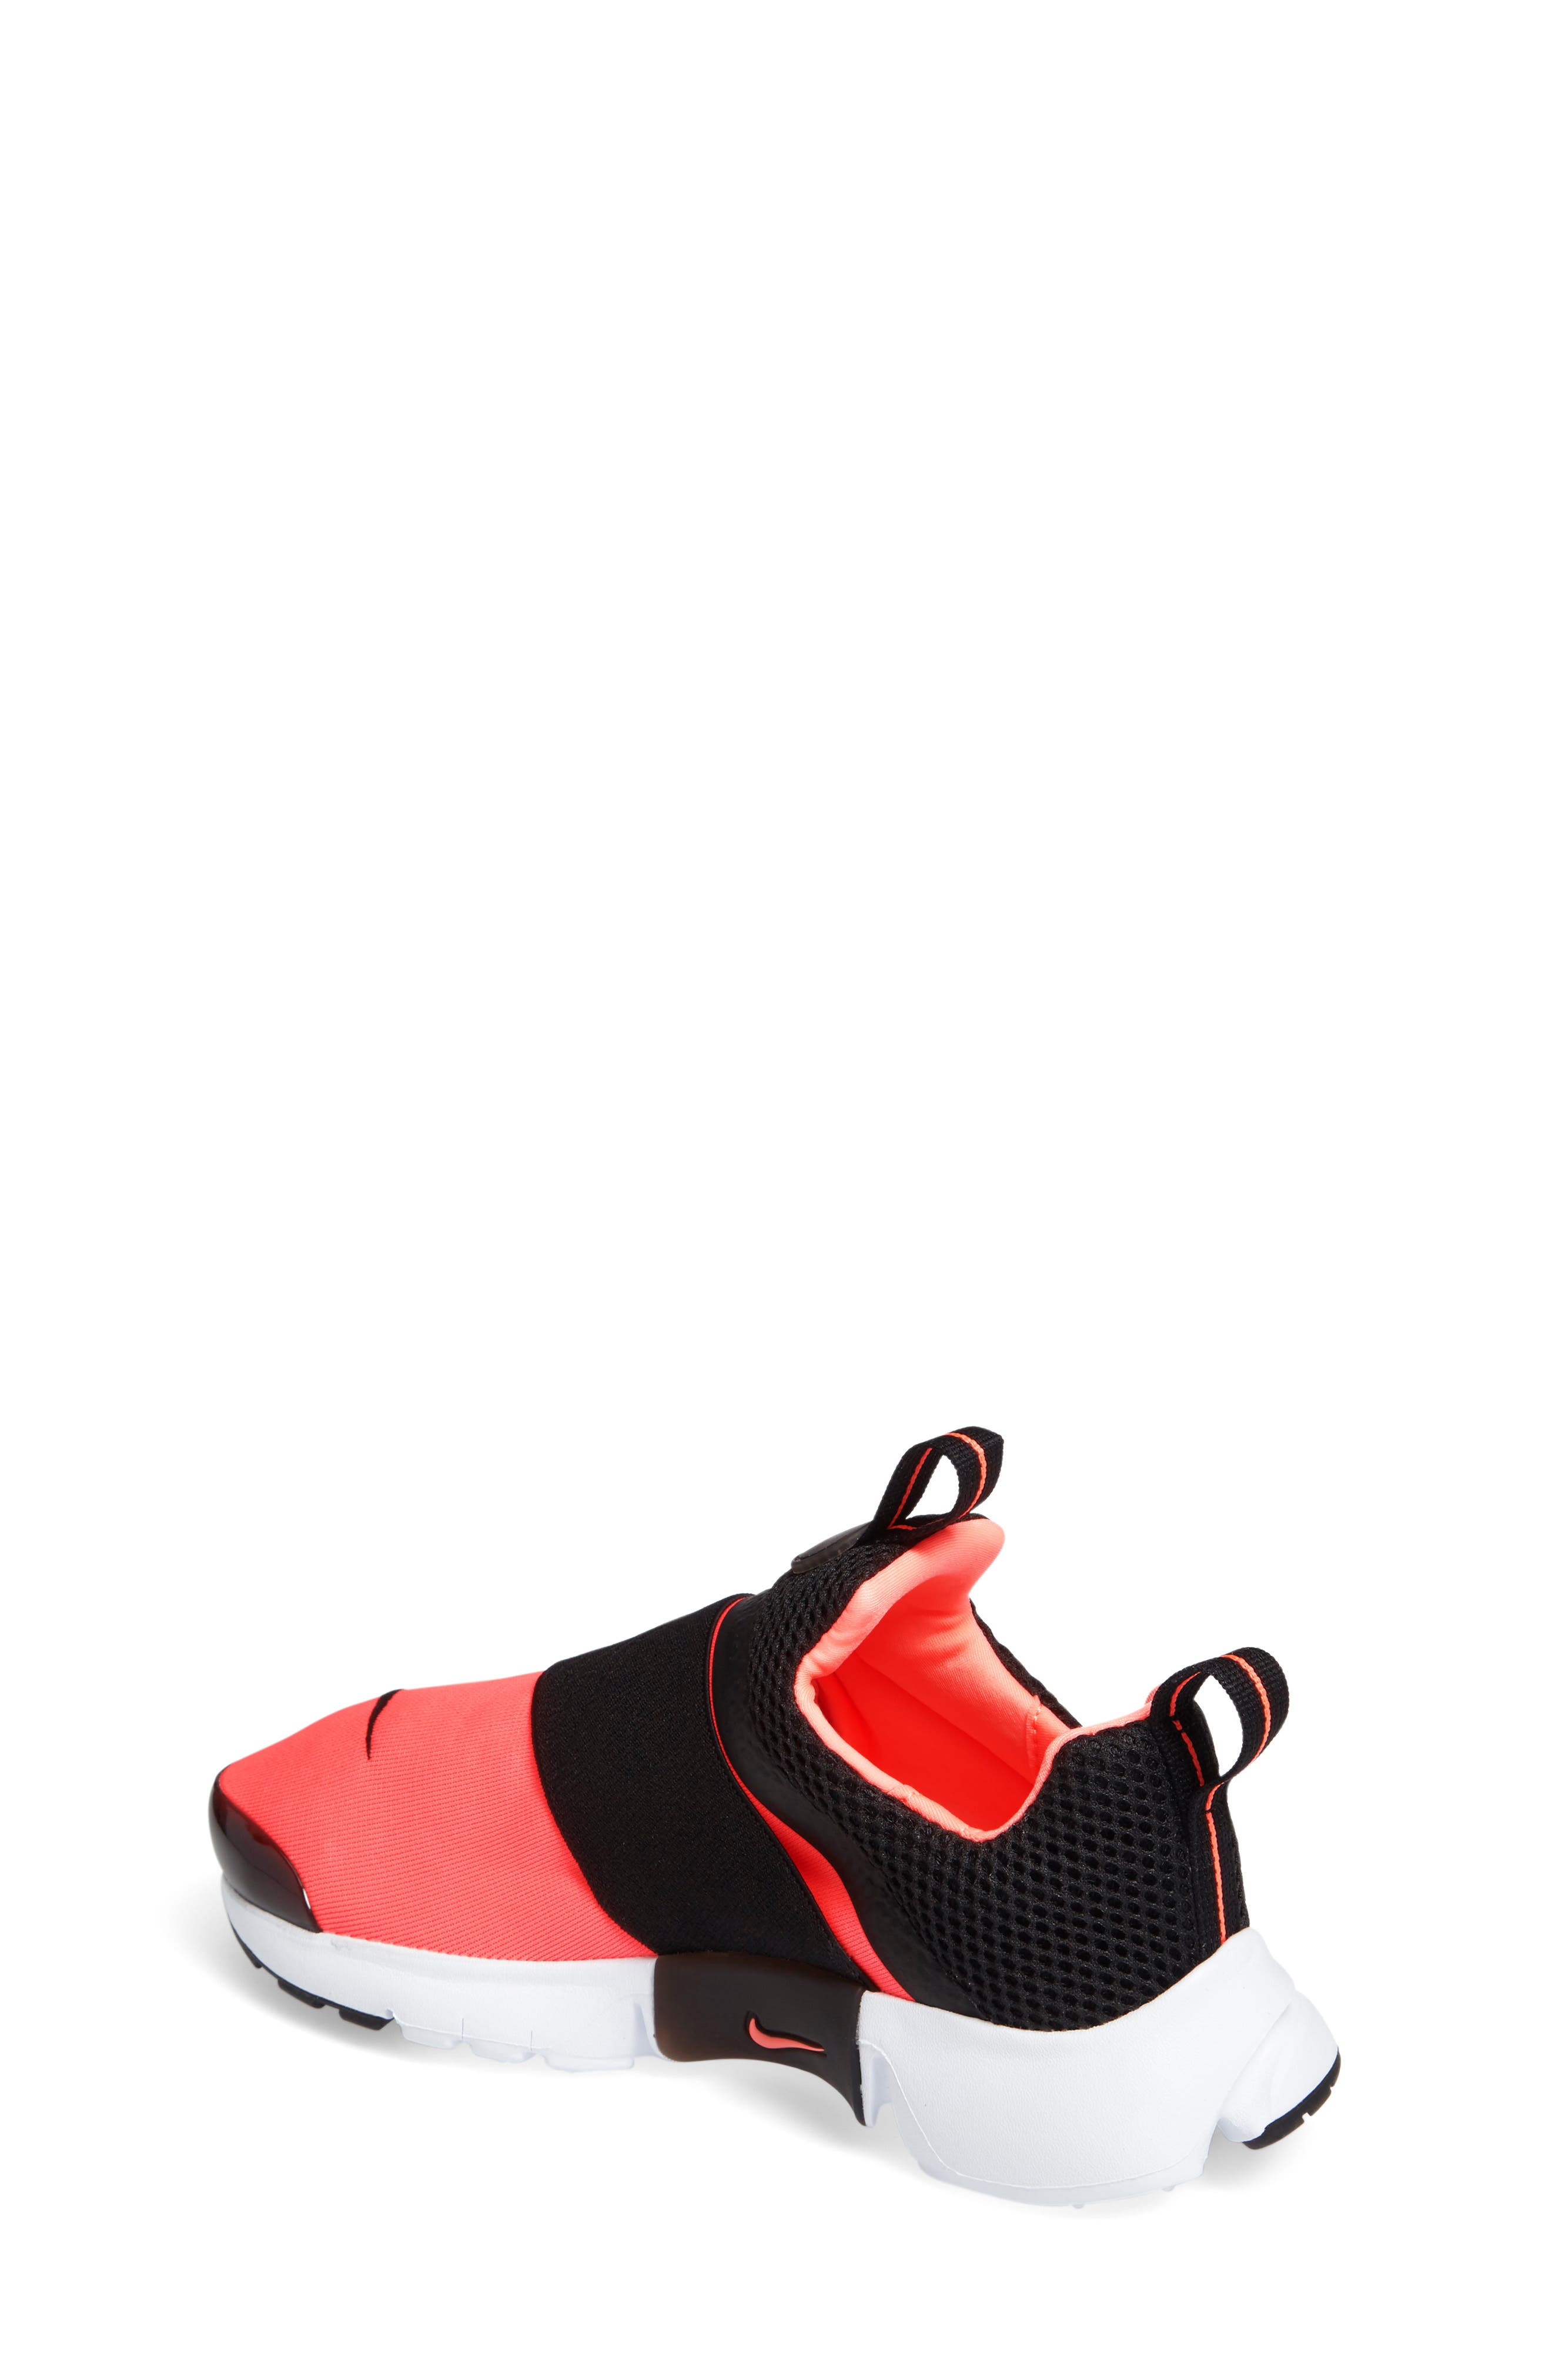 Presto Extreme Sneaker,                             Alternate thumbnail 7, color,